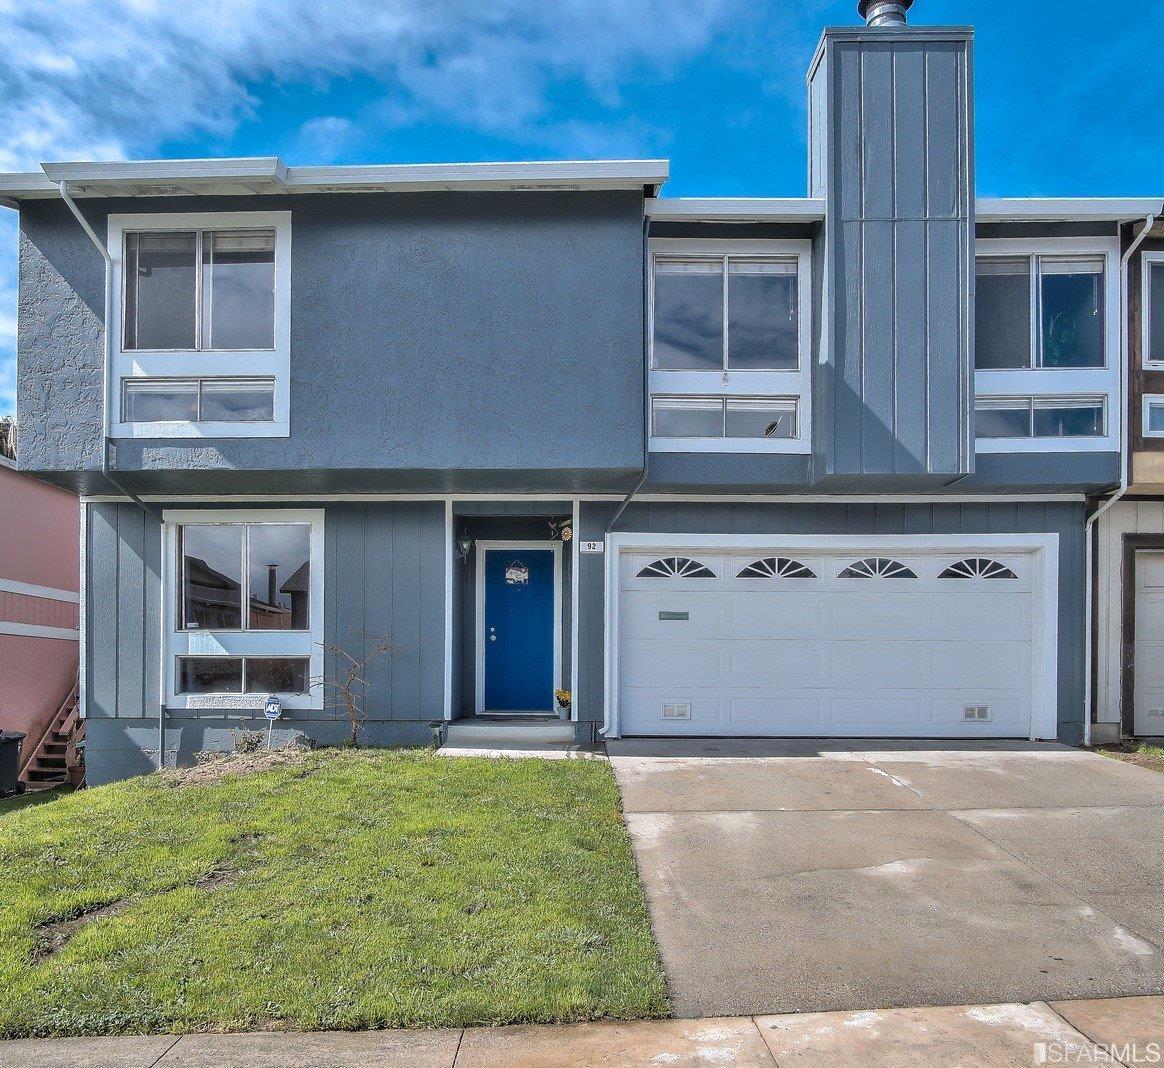 92 Morton Drive, Daly City, CA 94015 - MLS 468301 - Coldwell Banker